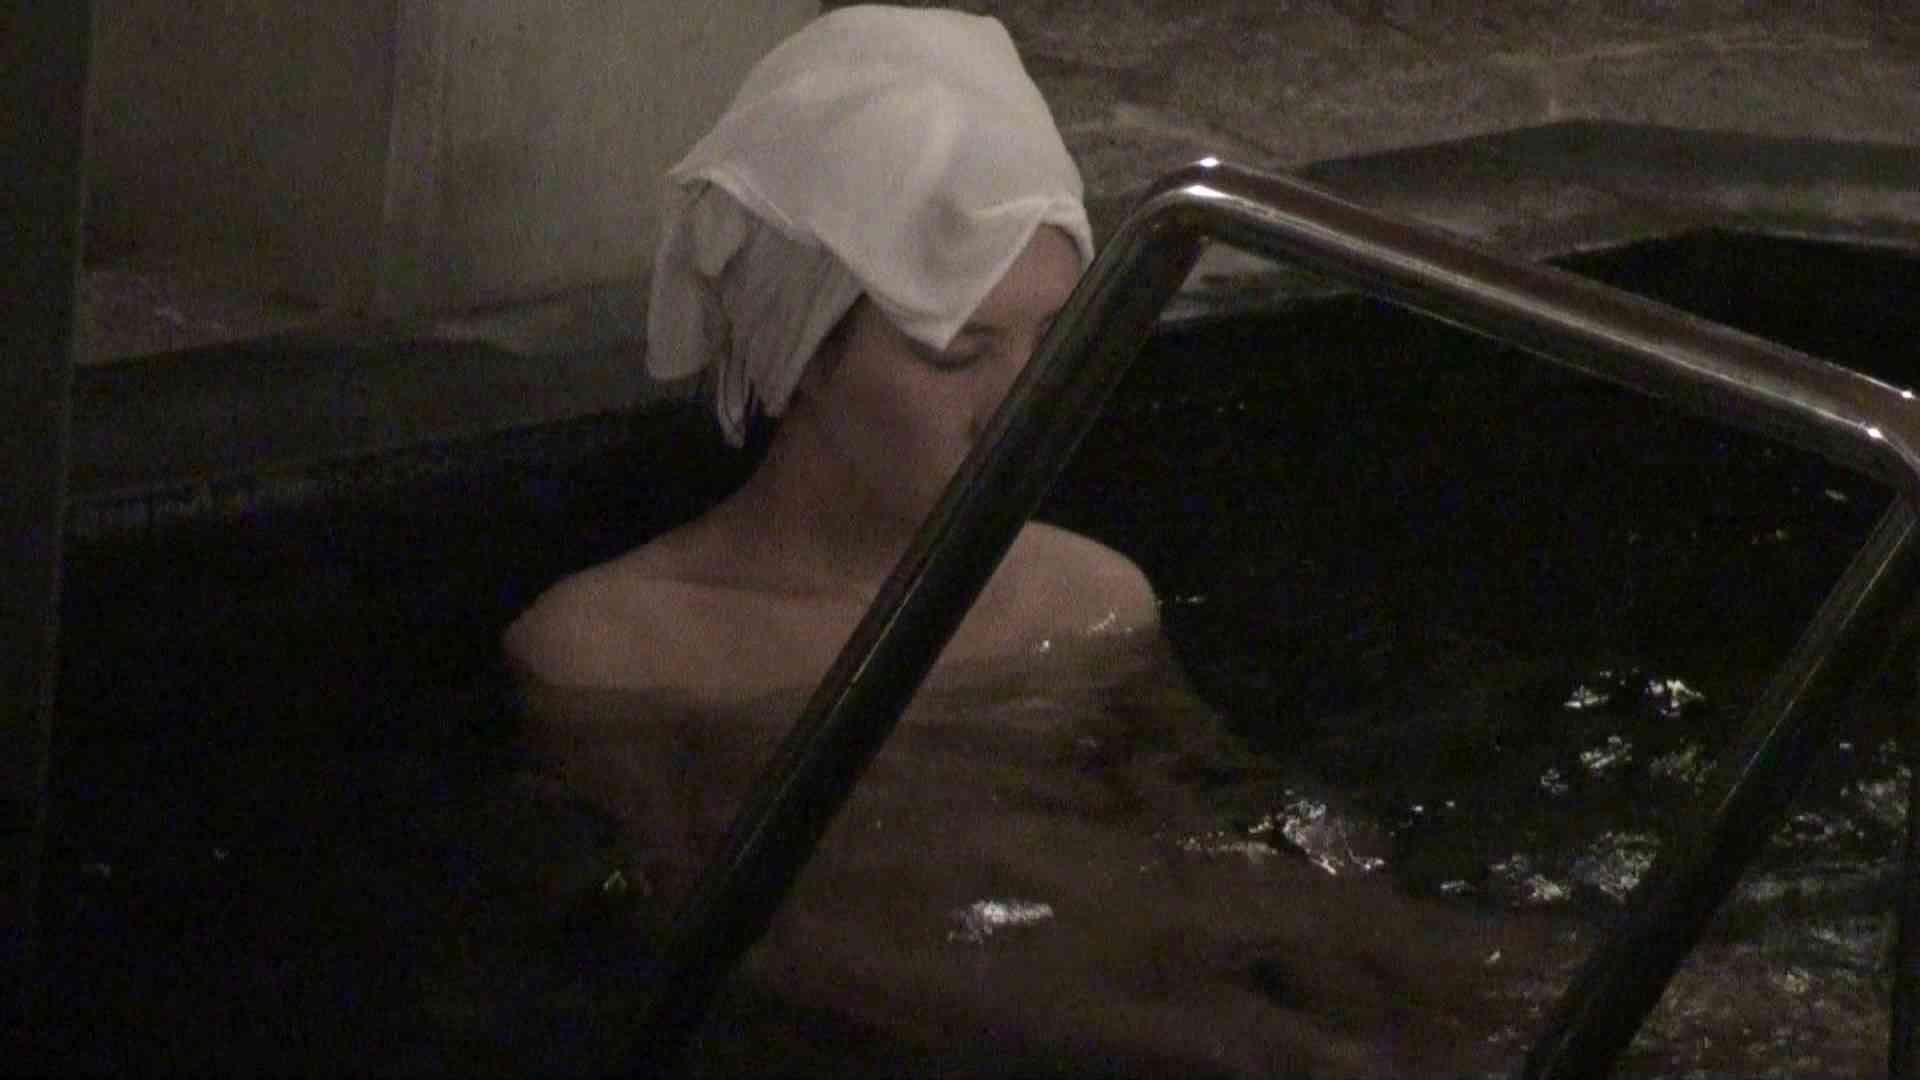 Aquaな露天風呂Vol.358 美しいOLの裸体 | 露天風呂突入  80pic 4